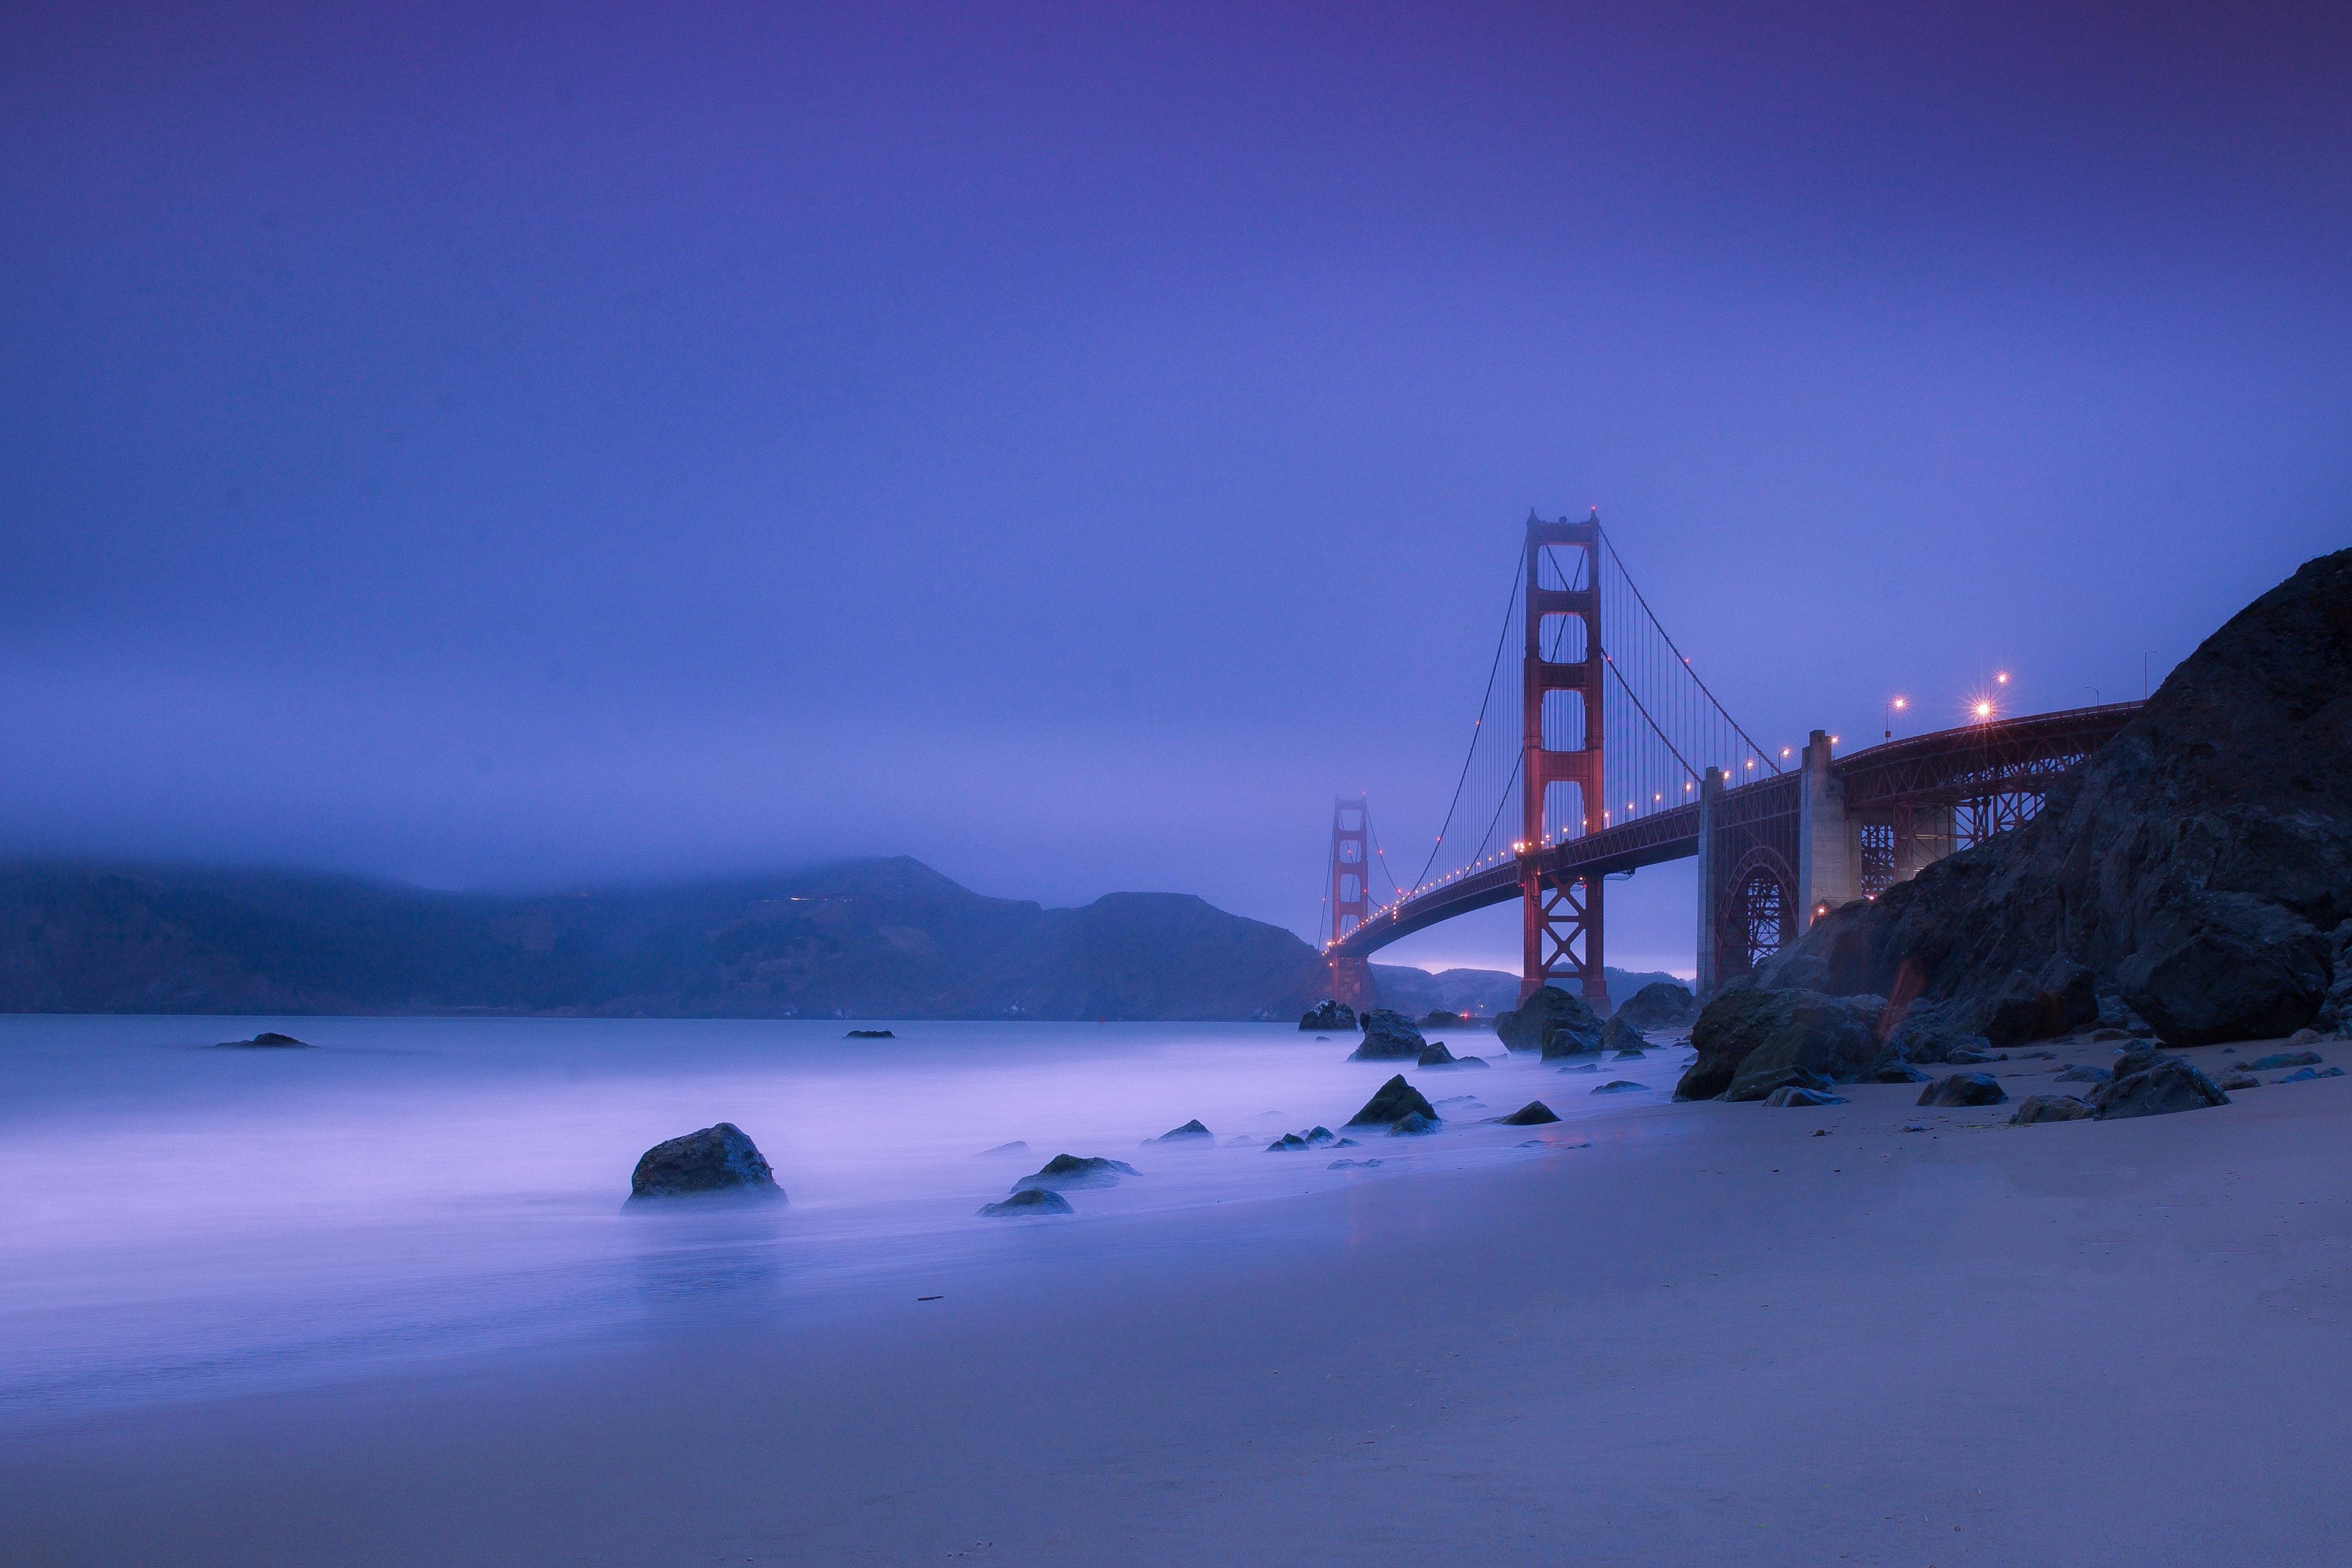 Golden gate bridge during nighttime photo